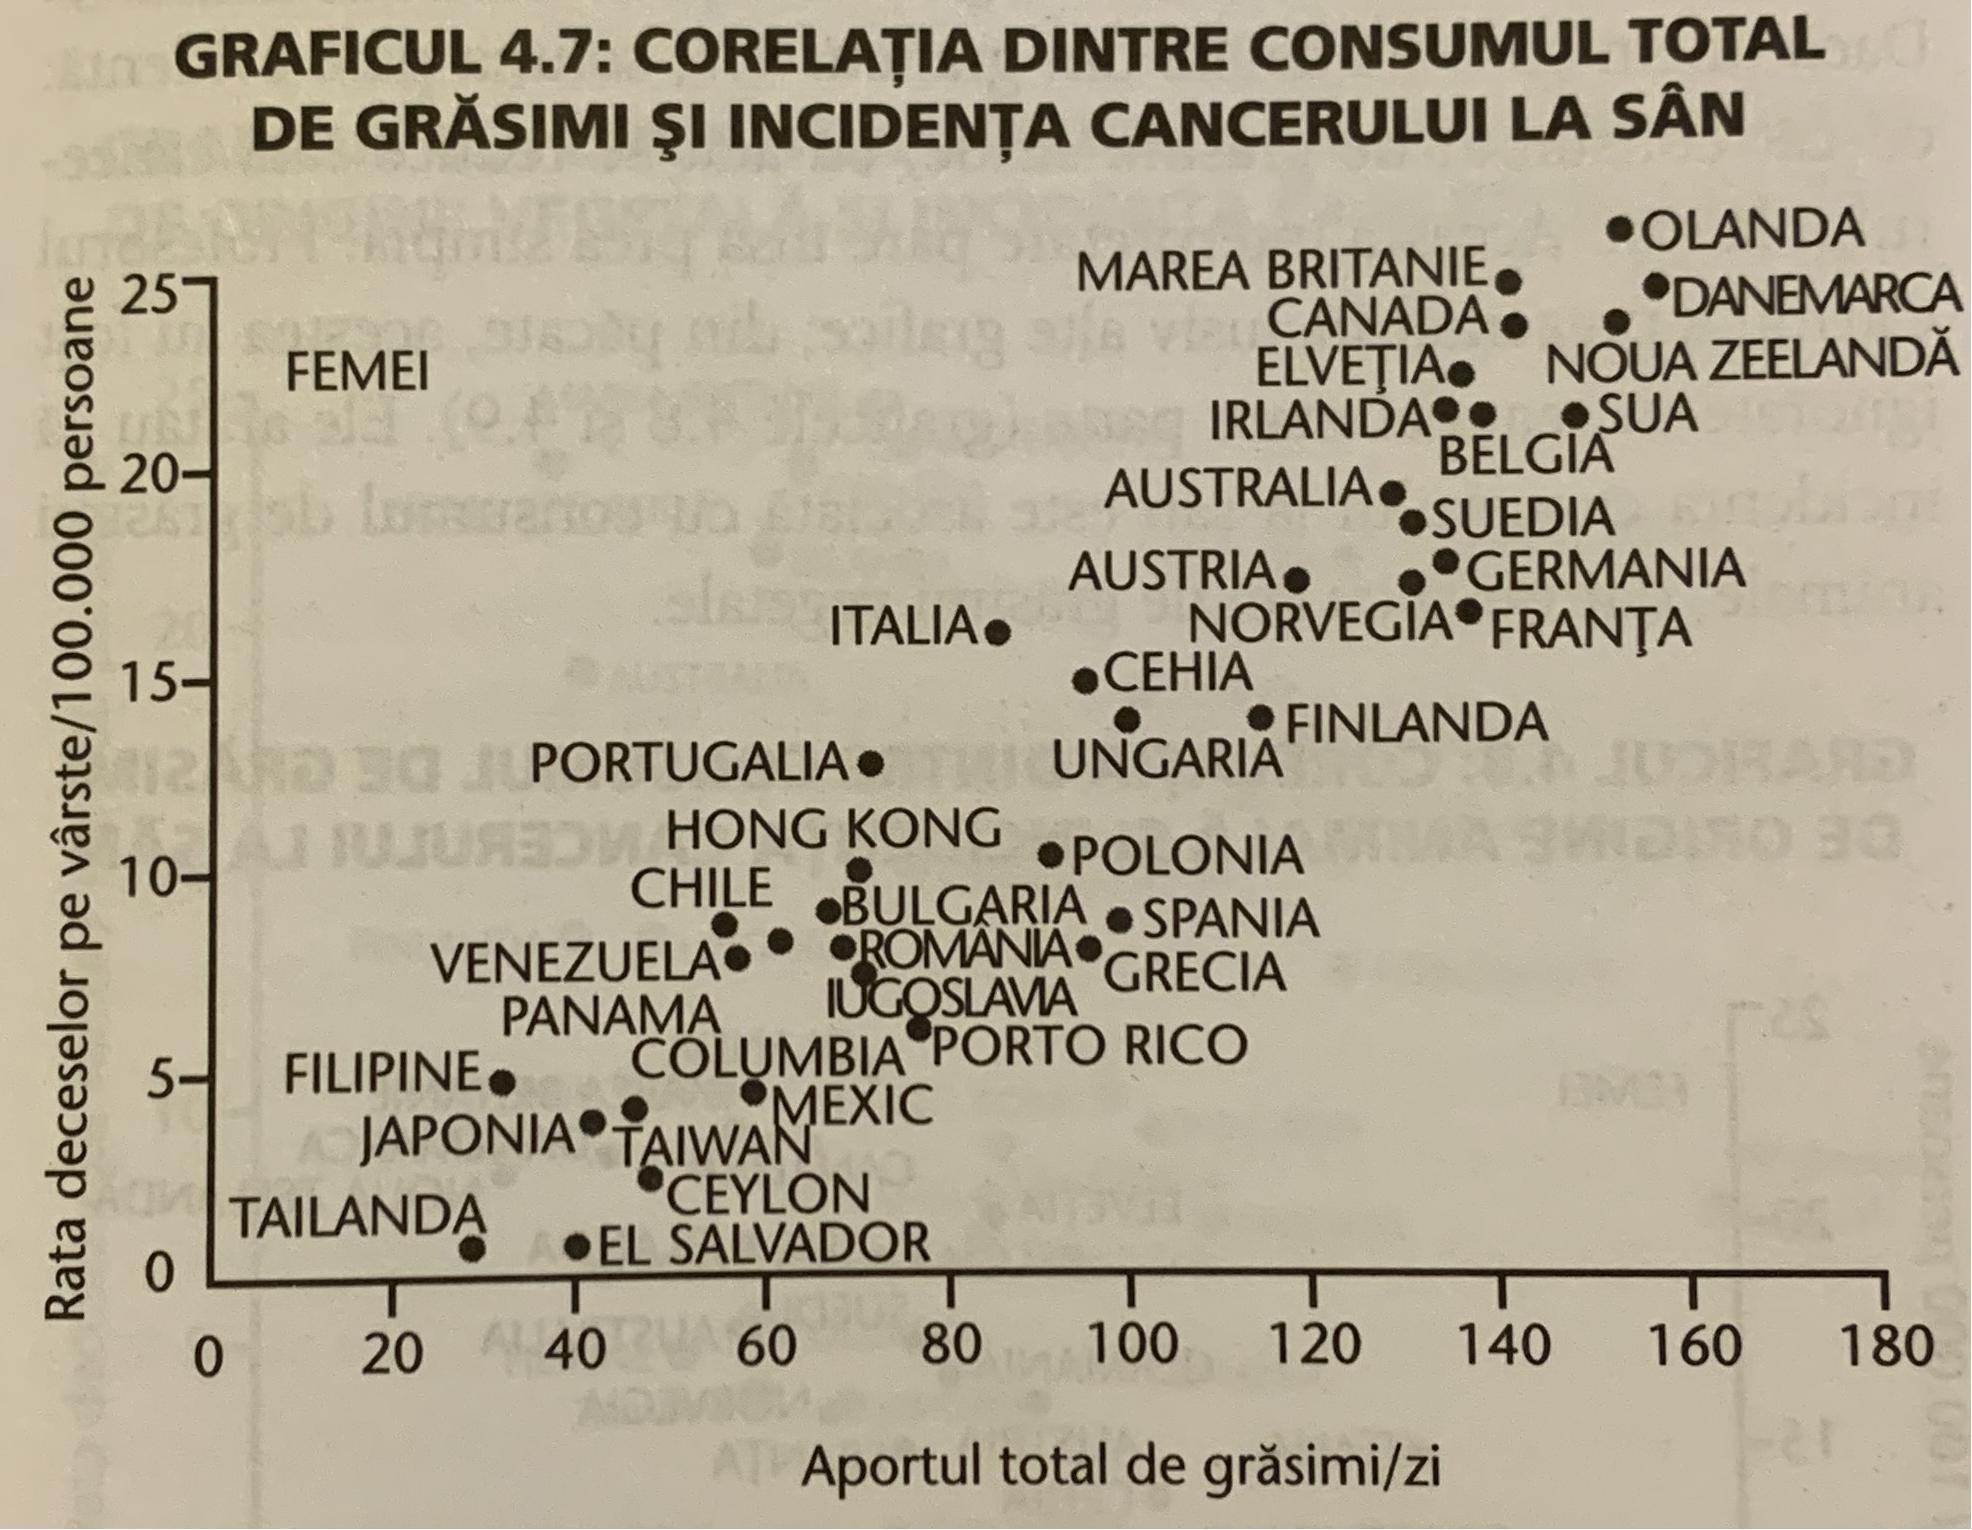 Graficul 4.7 din Studiul China, Dr. T. Colin Campbell